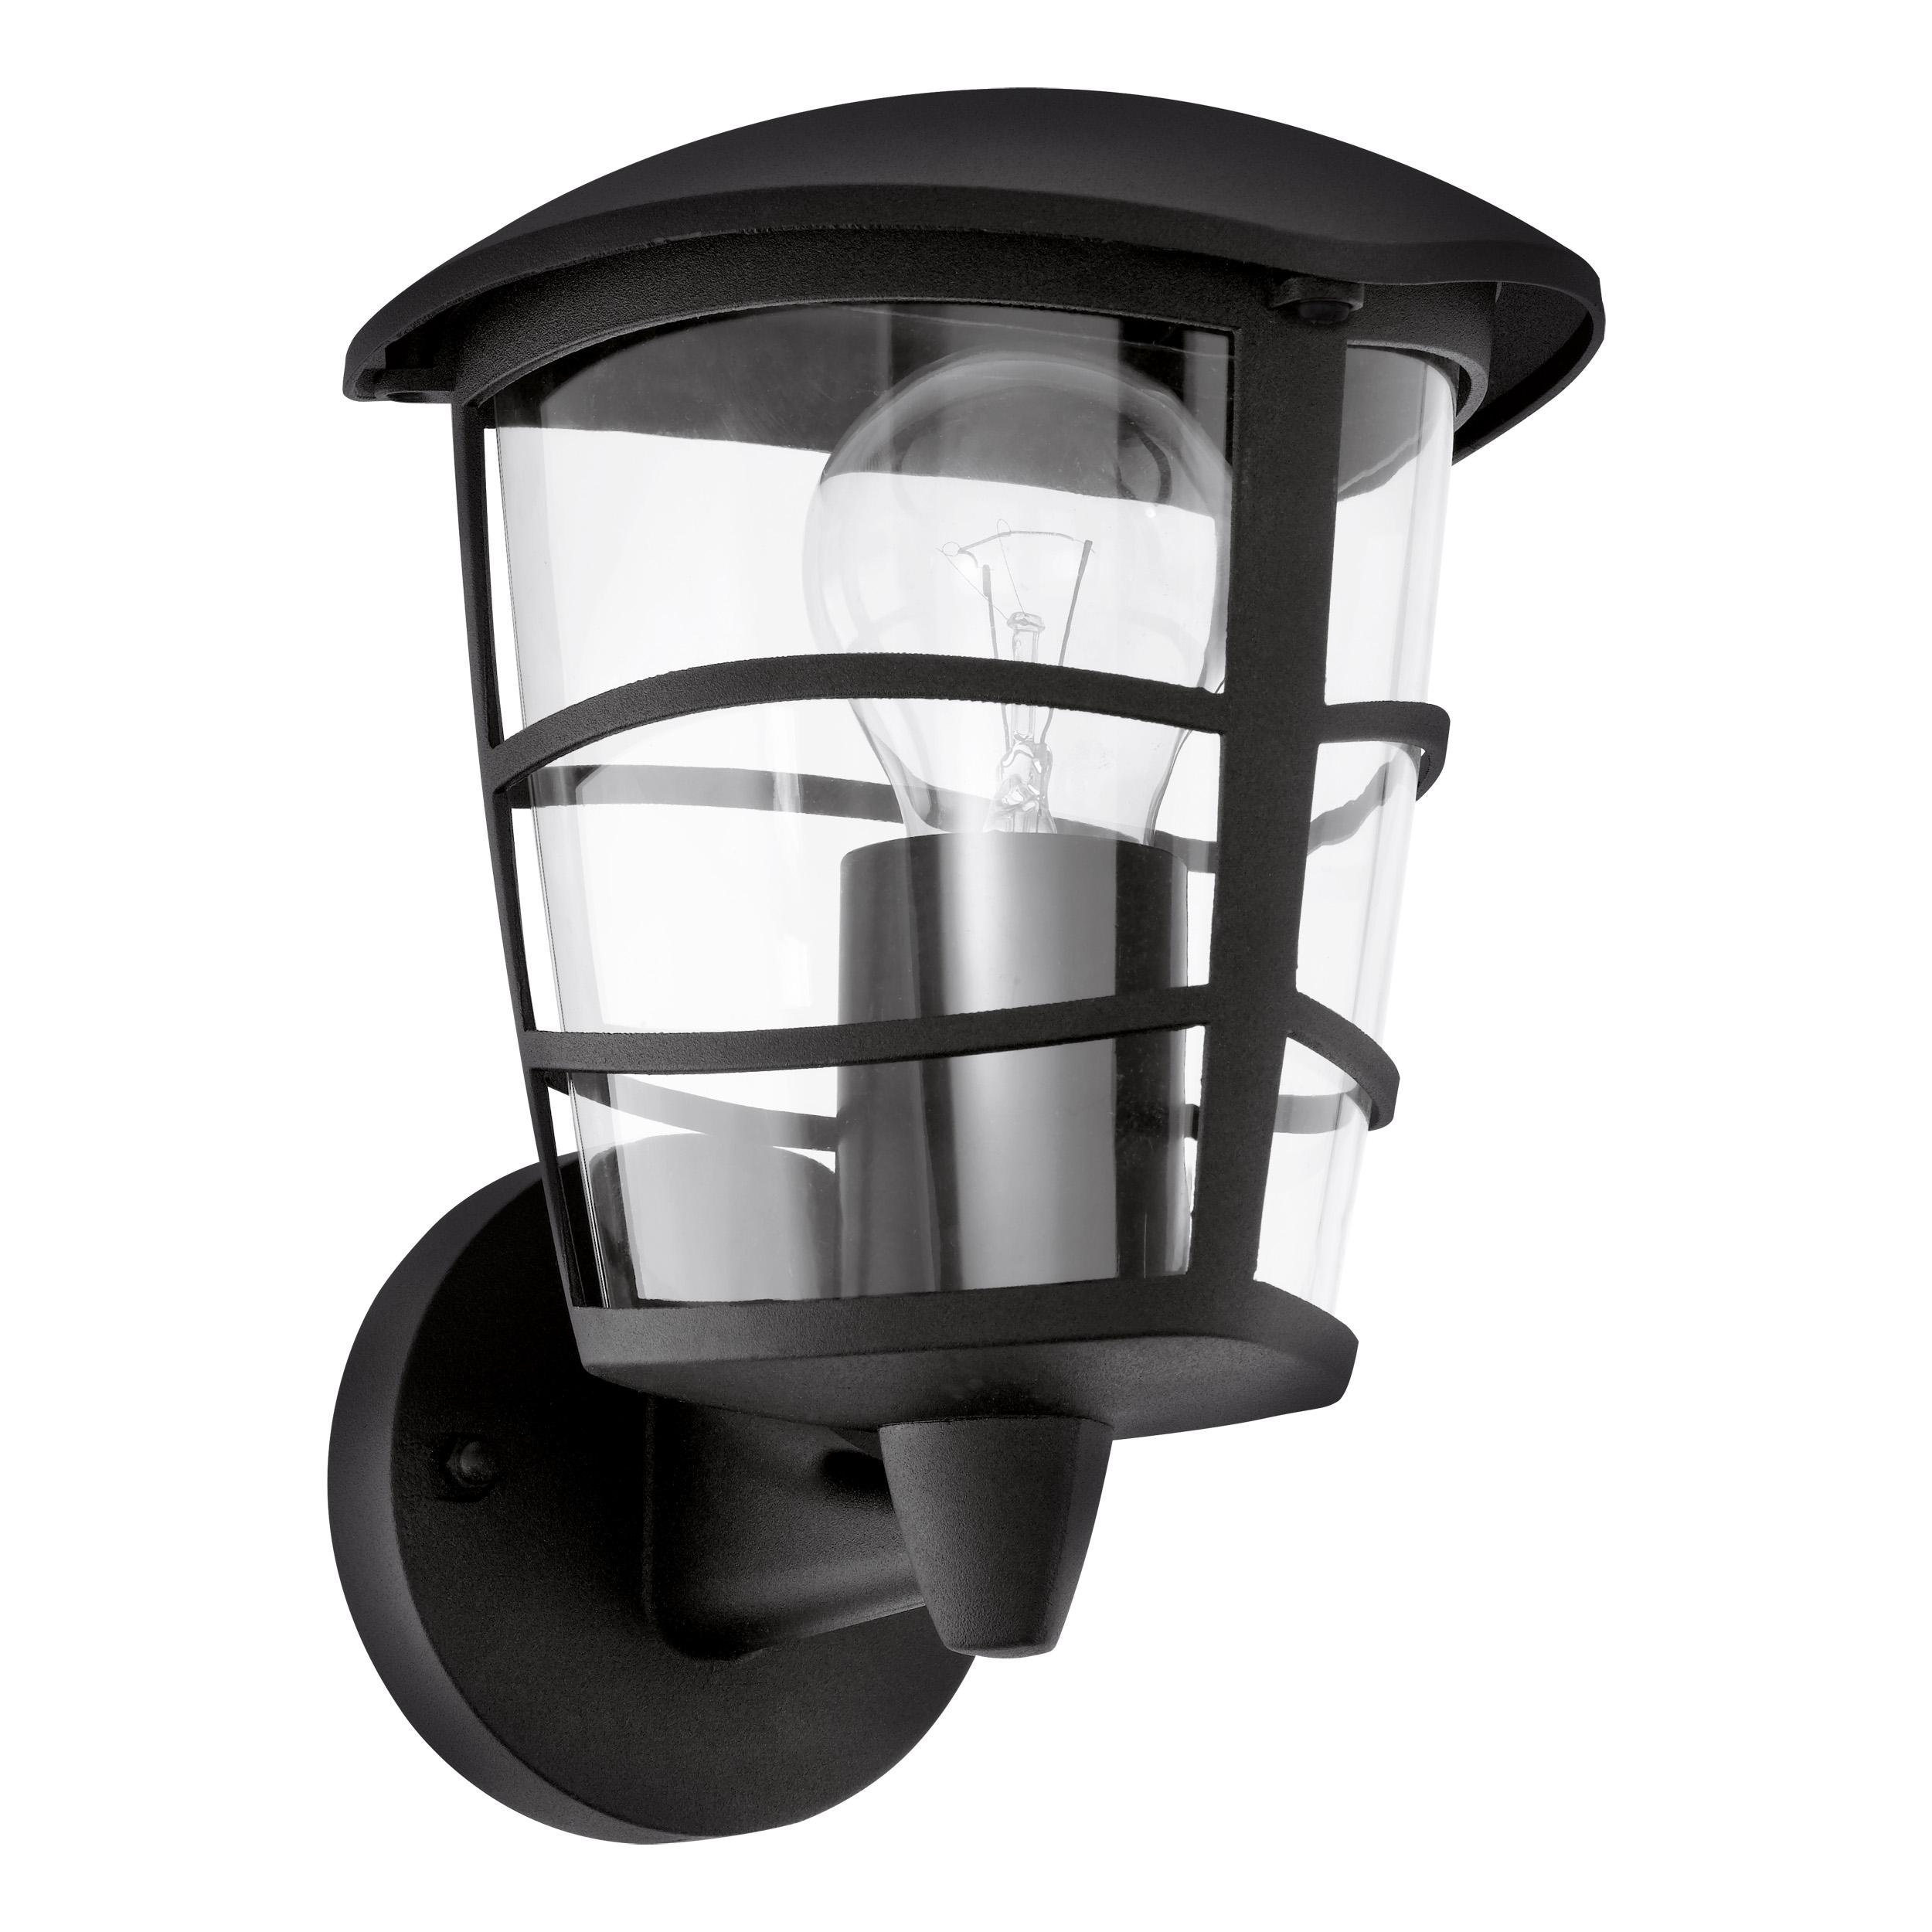 Wandlamp opwaarts zwart aloria